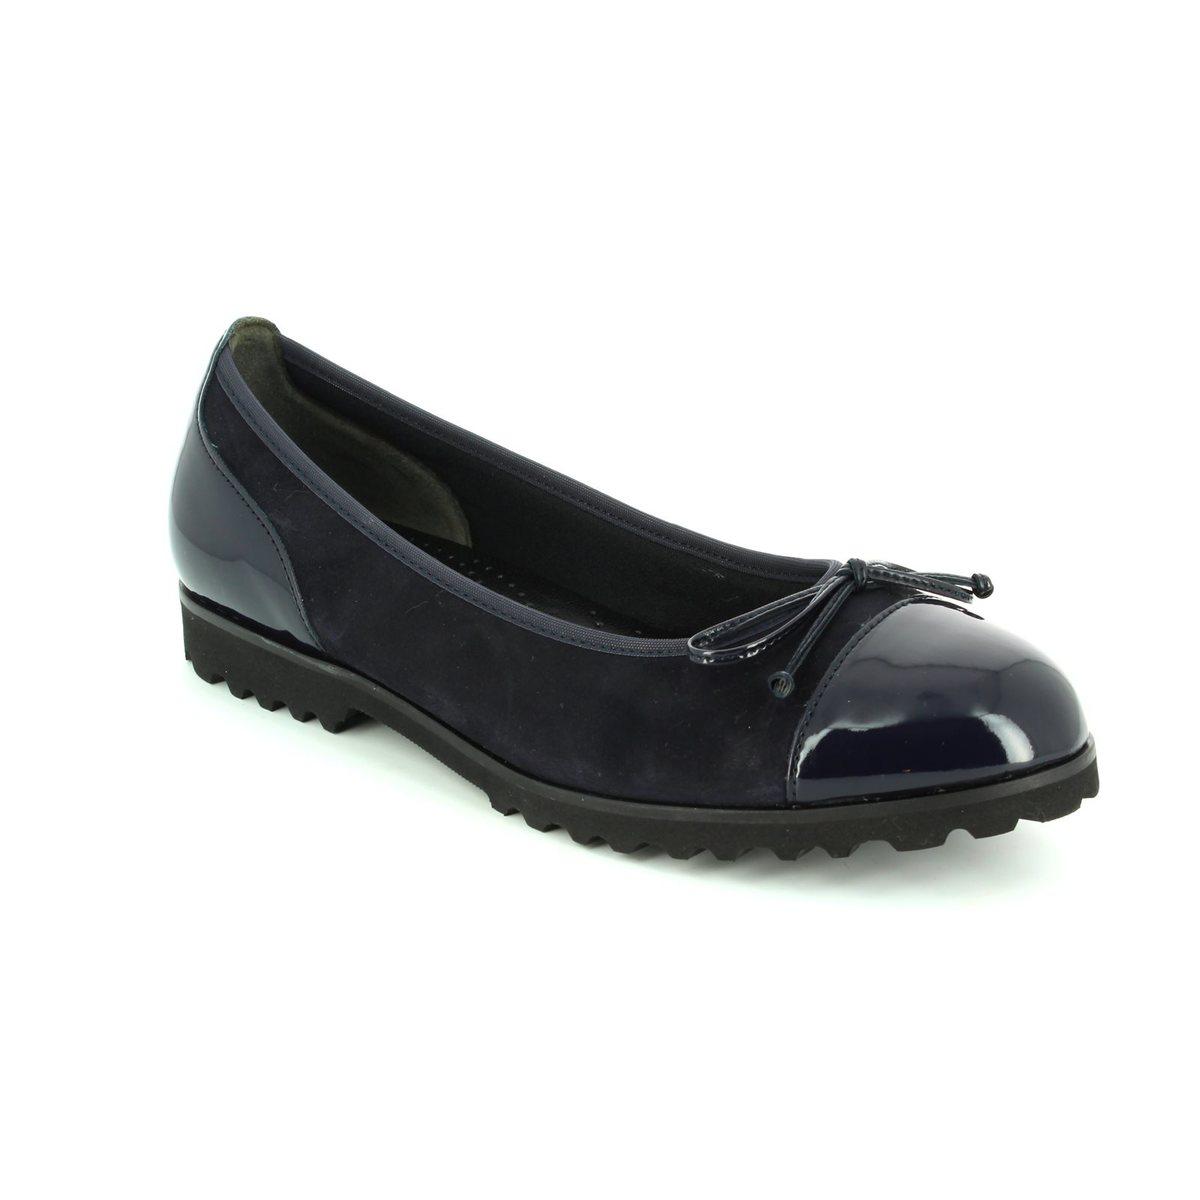 Crocs Shoe Store London